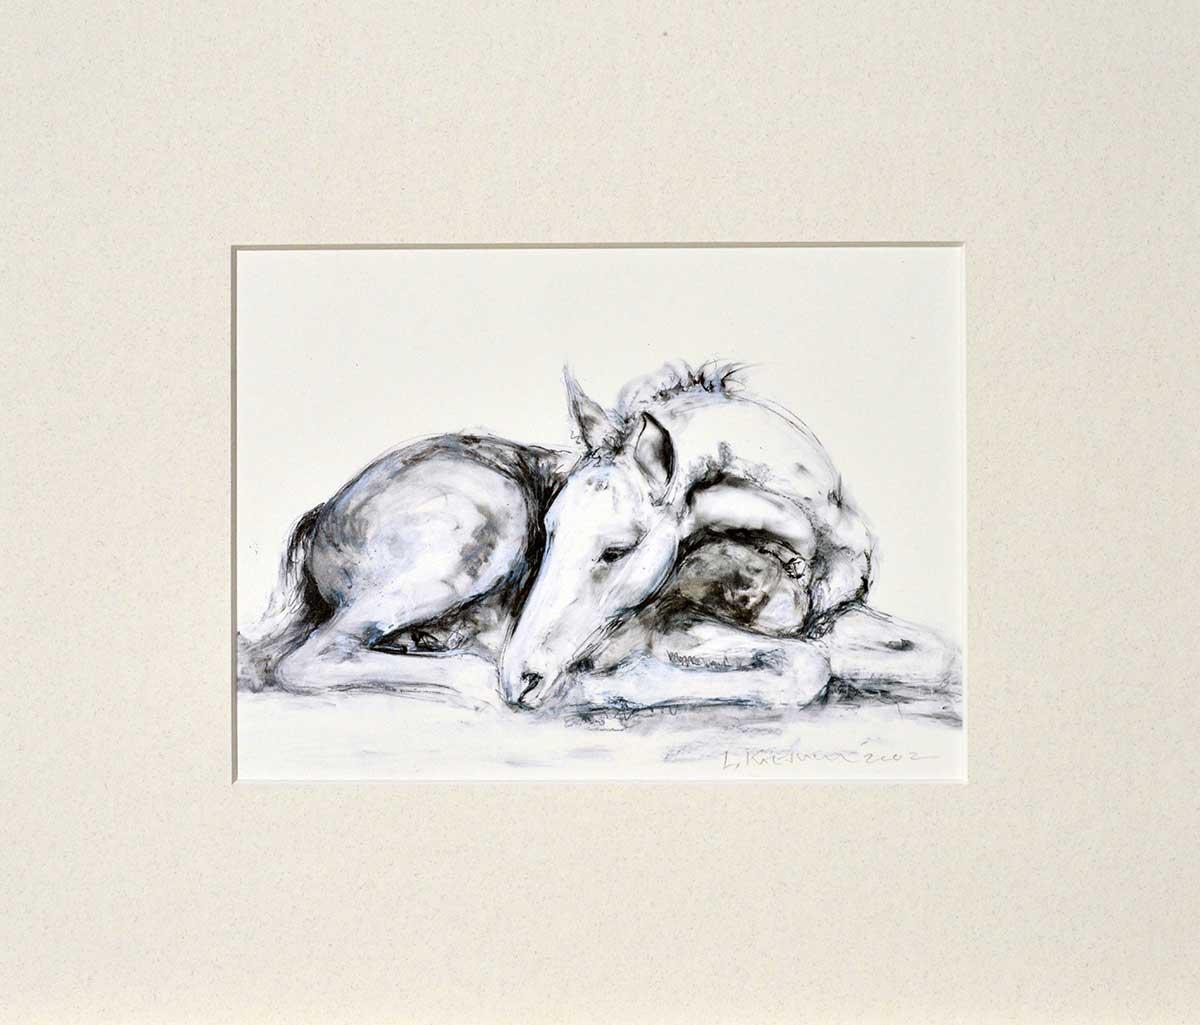 Lying Foal mounted print